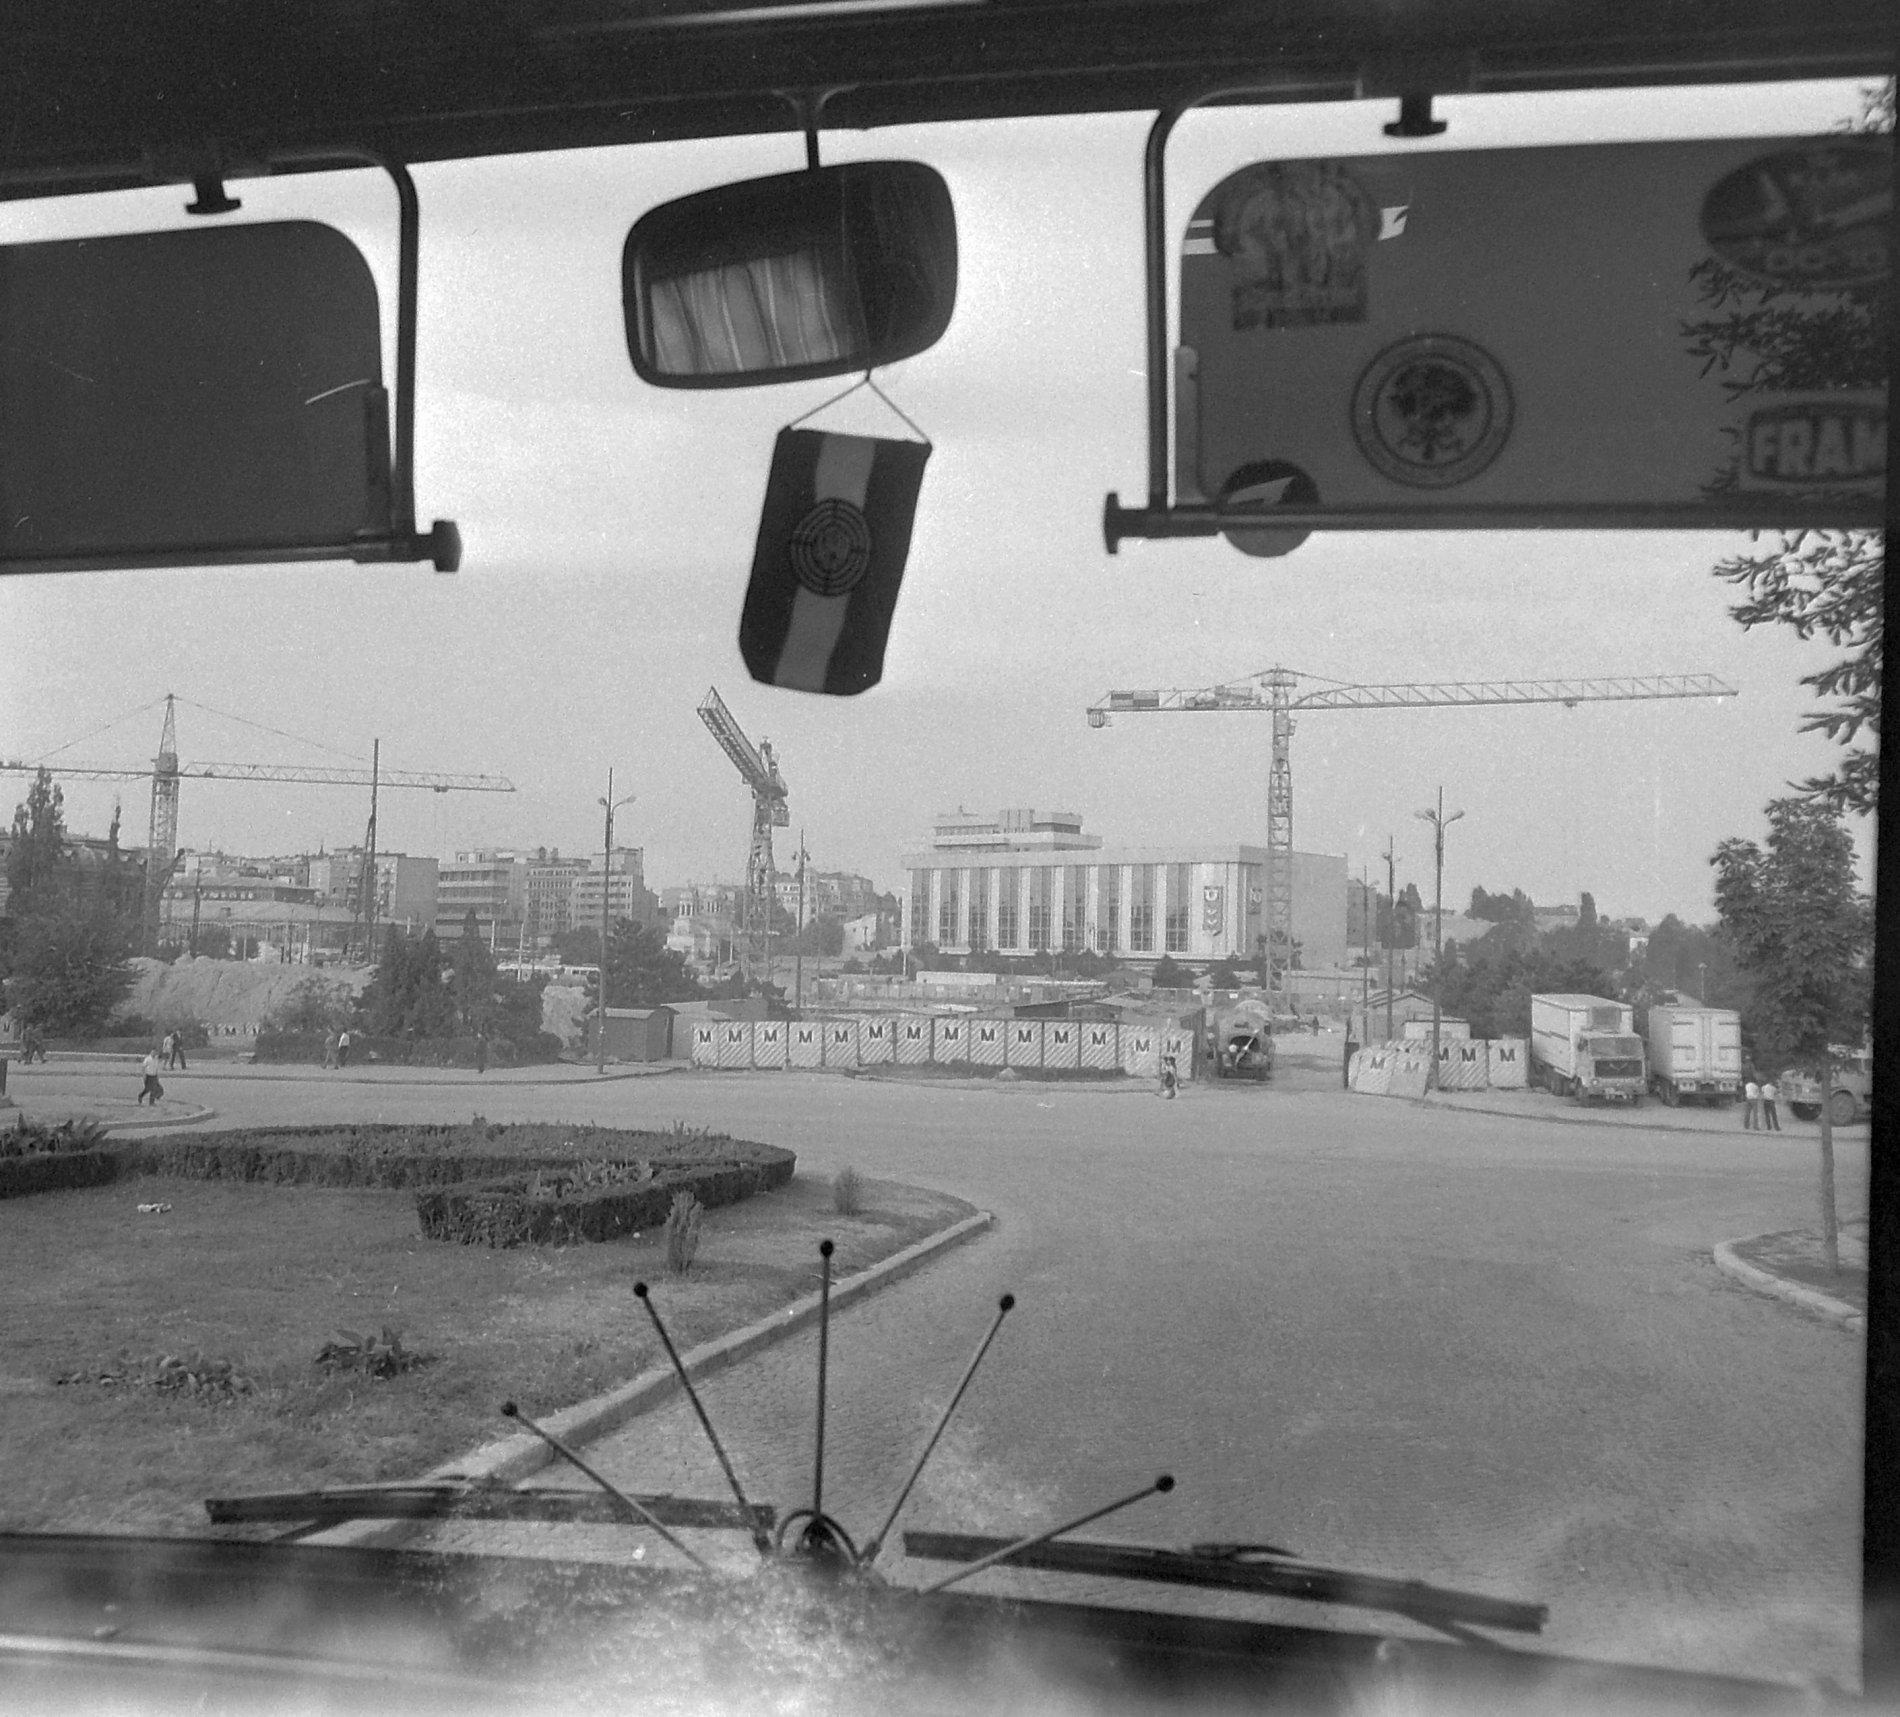 Poze din autocar - Poze din autocar